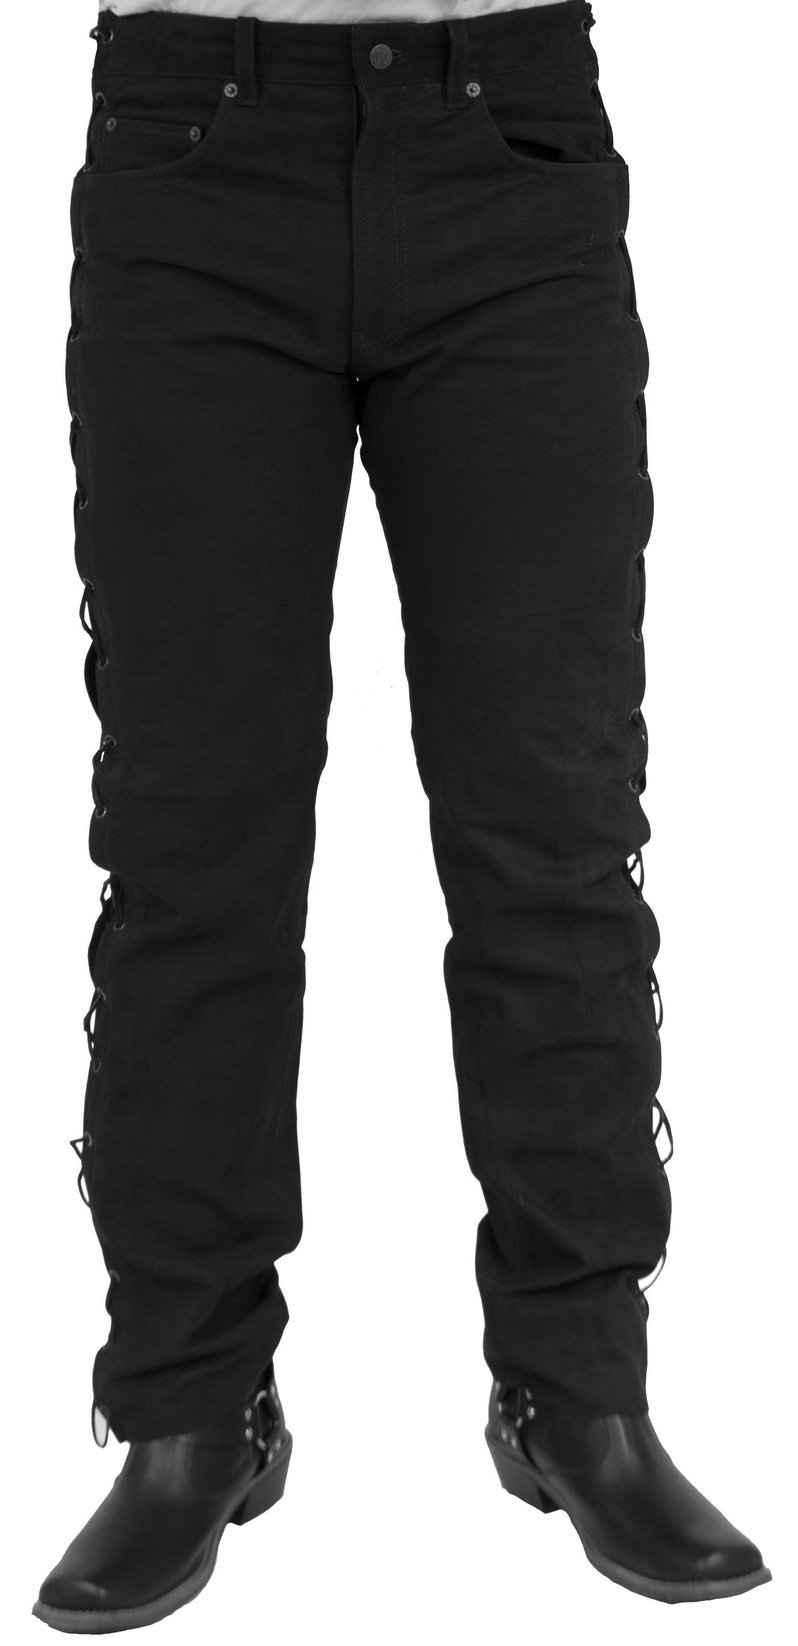 RICANO Lederhose »NBK-101« Hochwertige Büffel-Nubuk Leder im Five-Pocket-Leder-Jeans-Style; Seitliche Schnürung